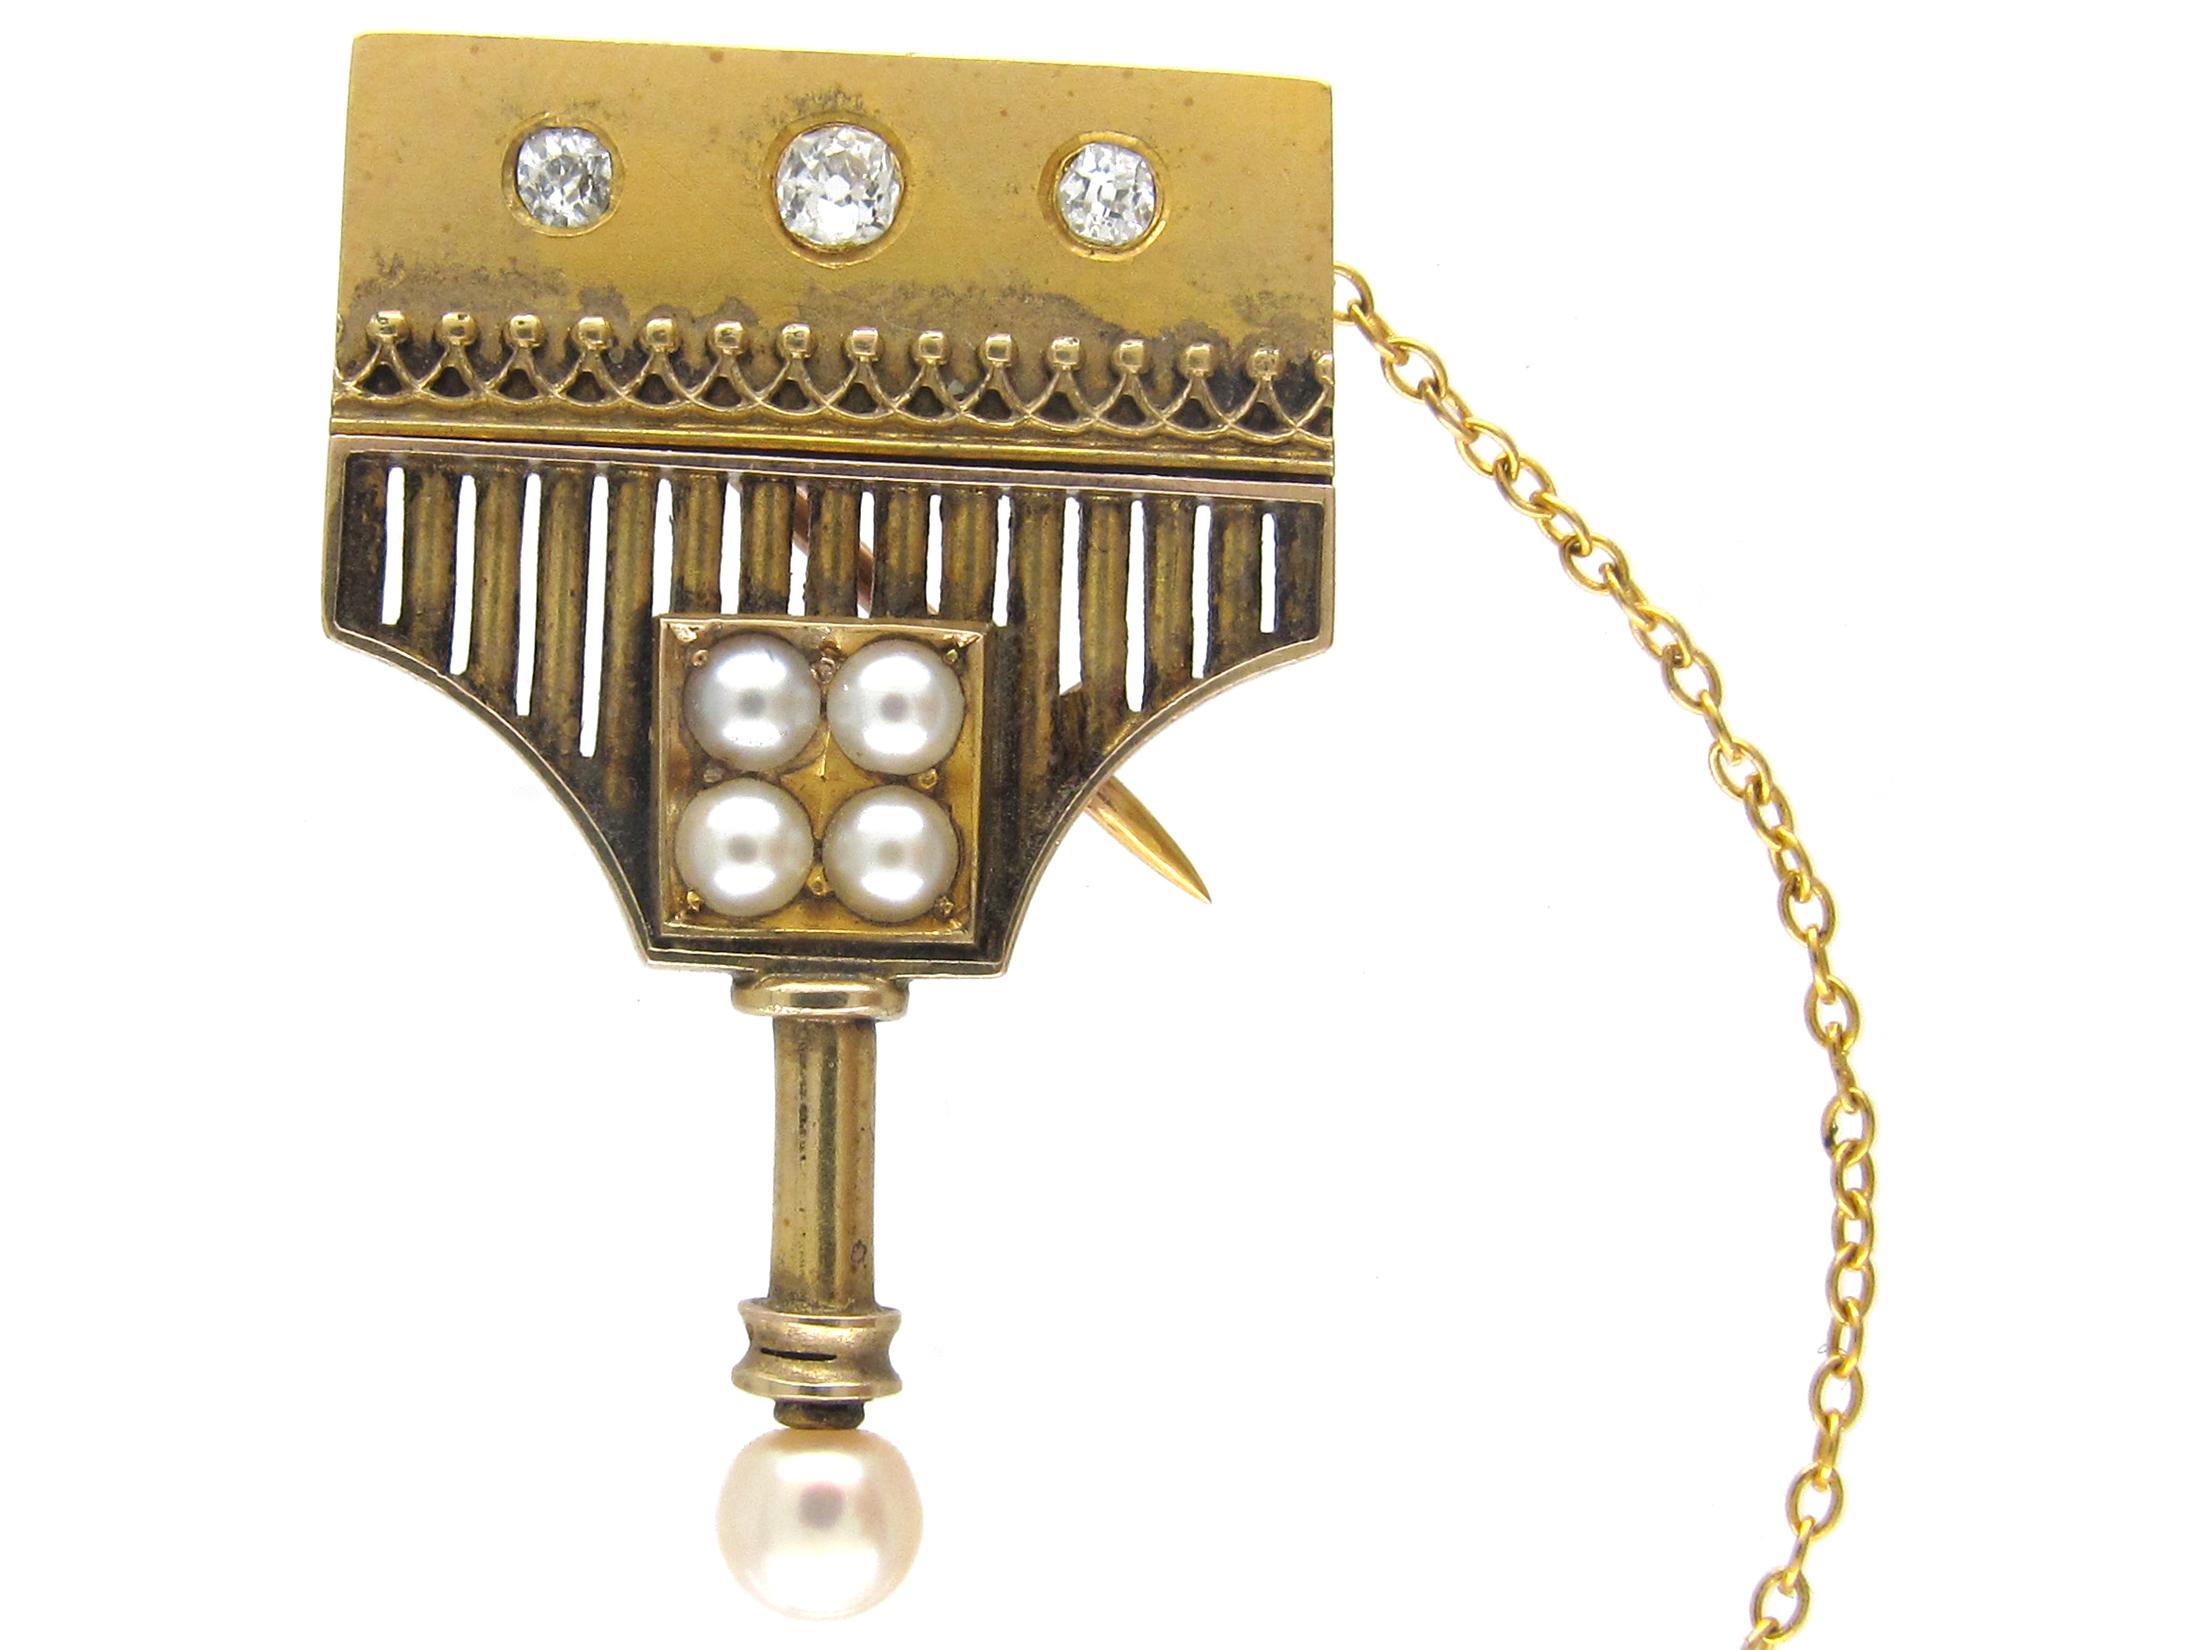 18ct Gold, Pearl & Diamond Brooch